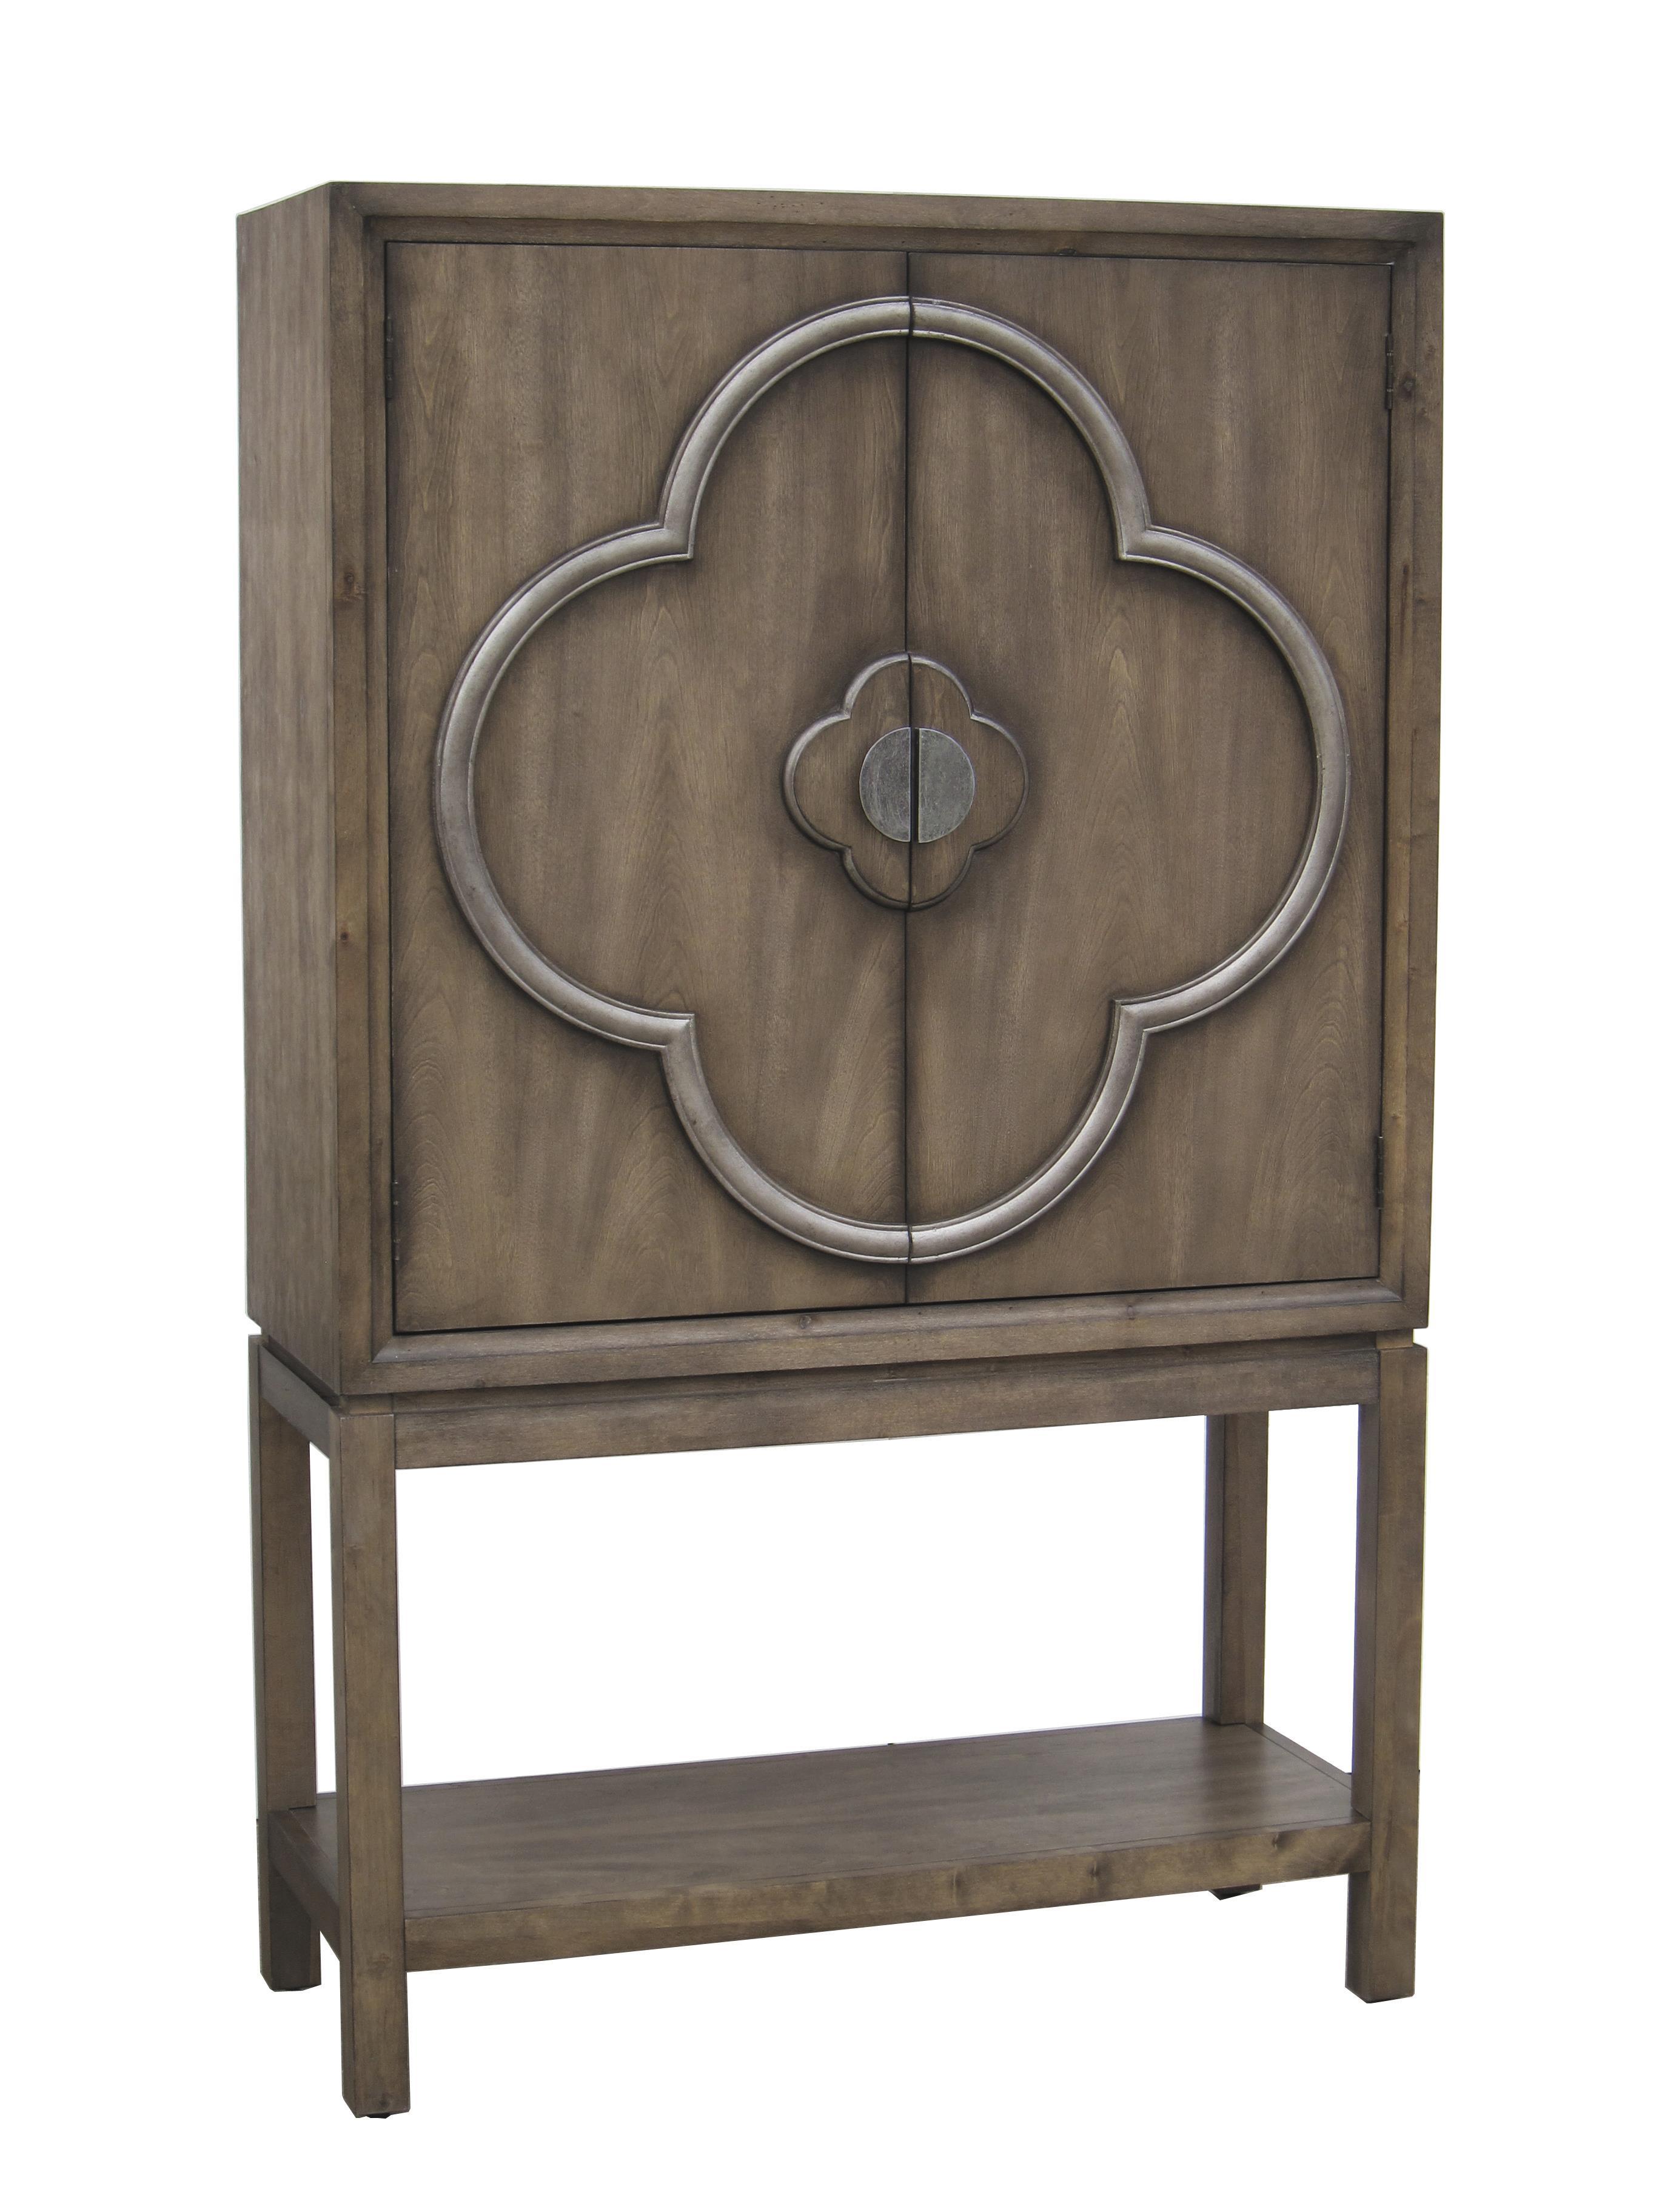 Pulaski Furniture Accents Wine Cabinet  - Item Number: 675126